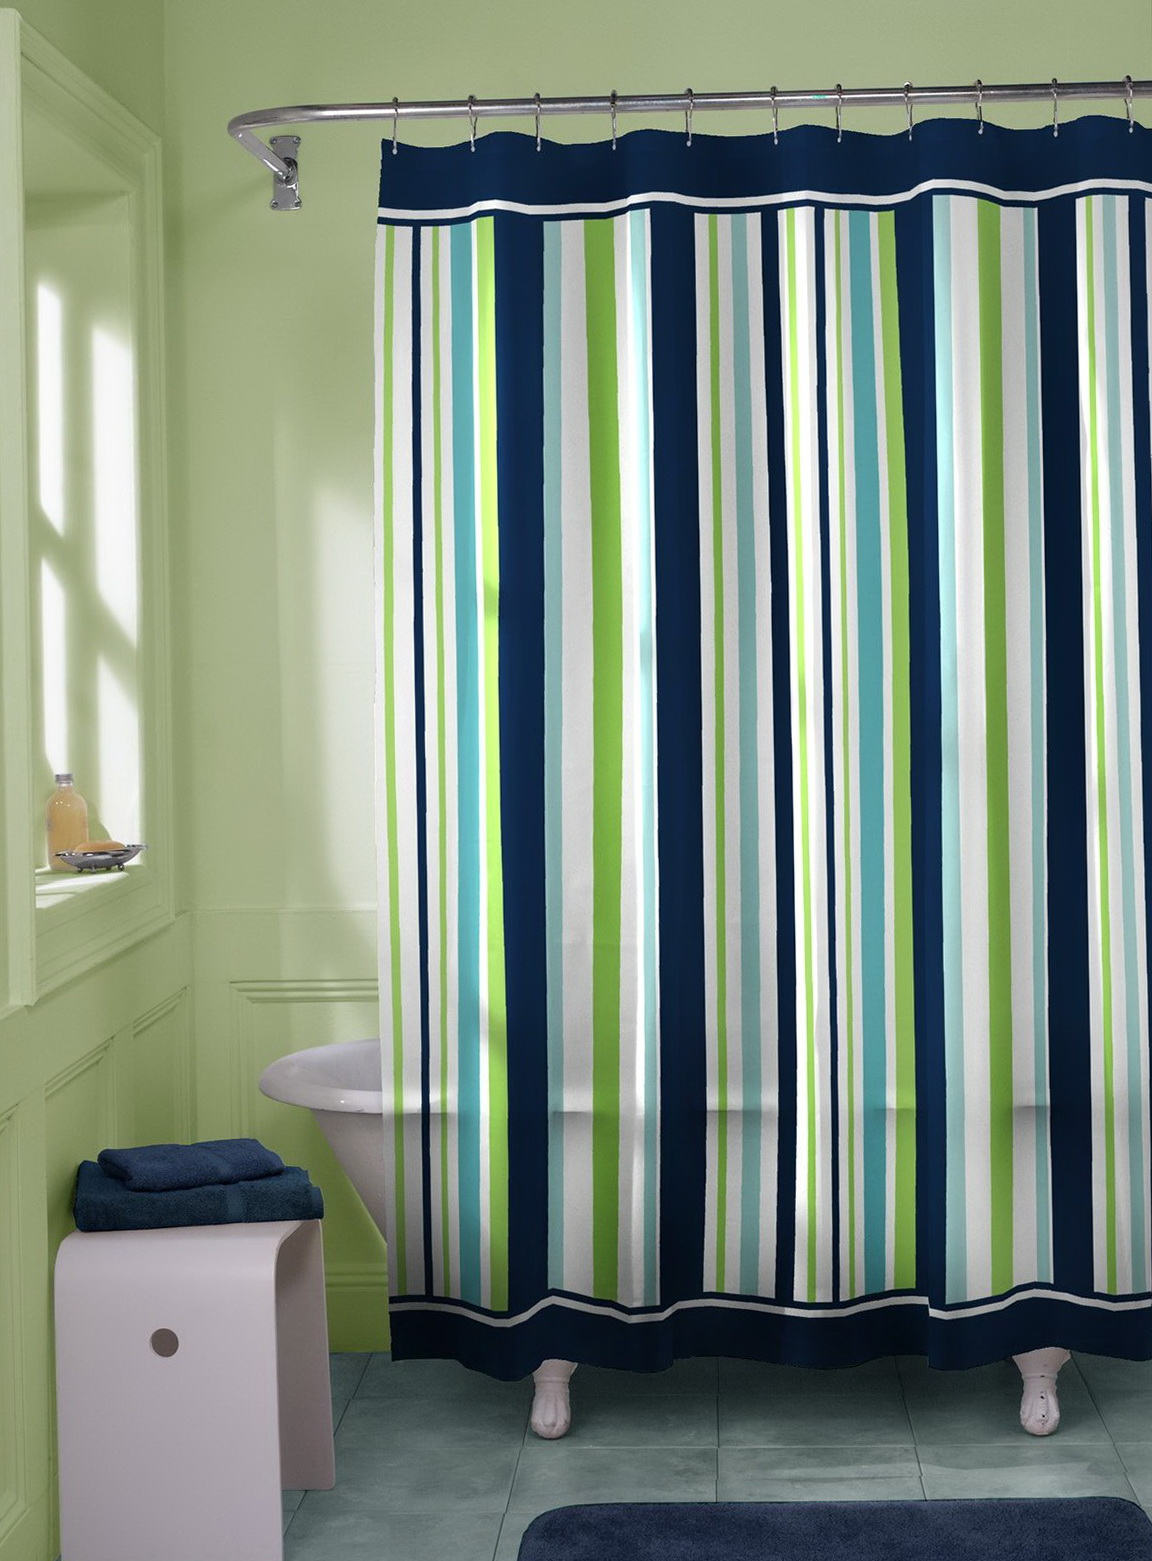 Shower Curtain Length Standard Home Design Ideas